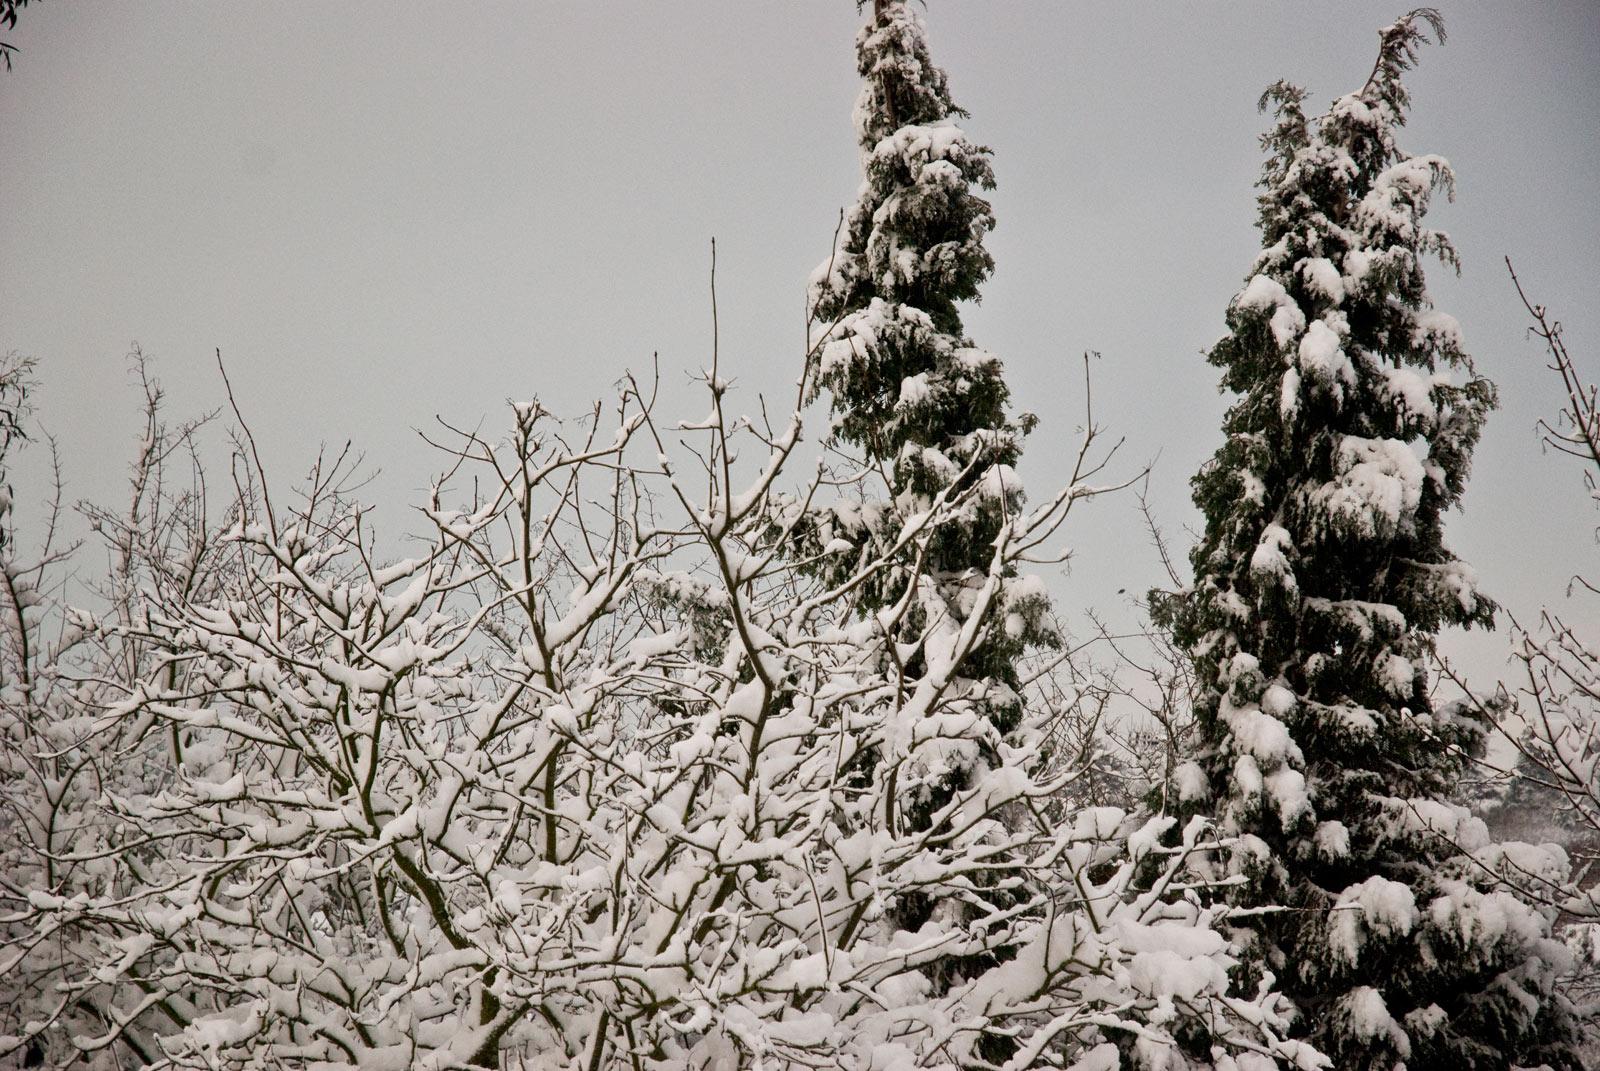 ICMSTUDIOS - Snow